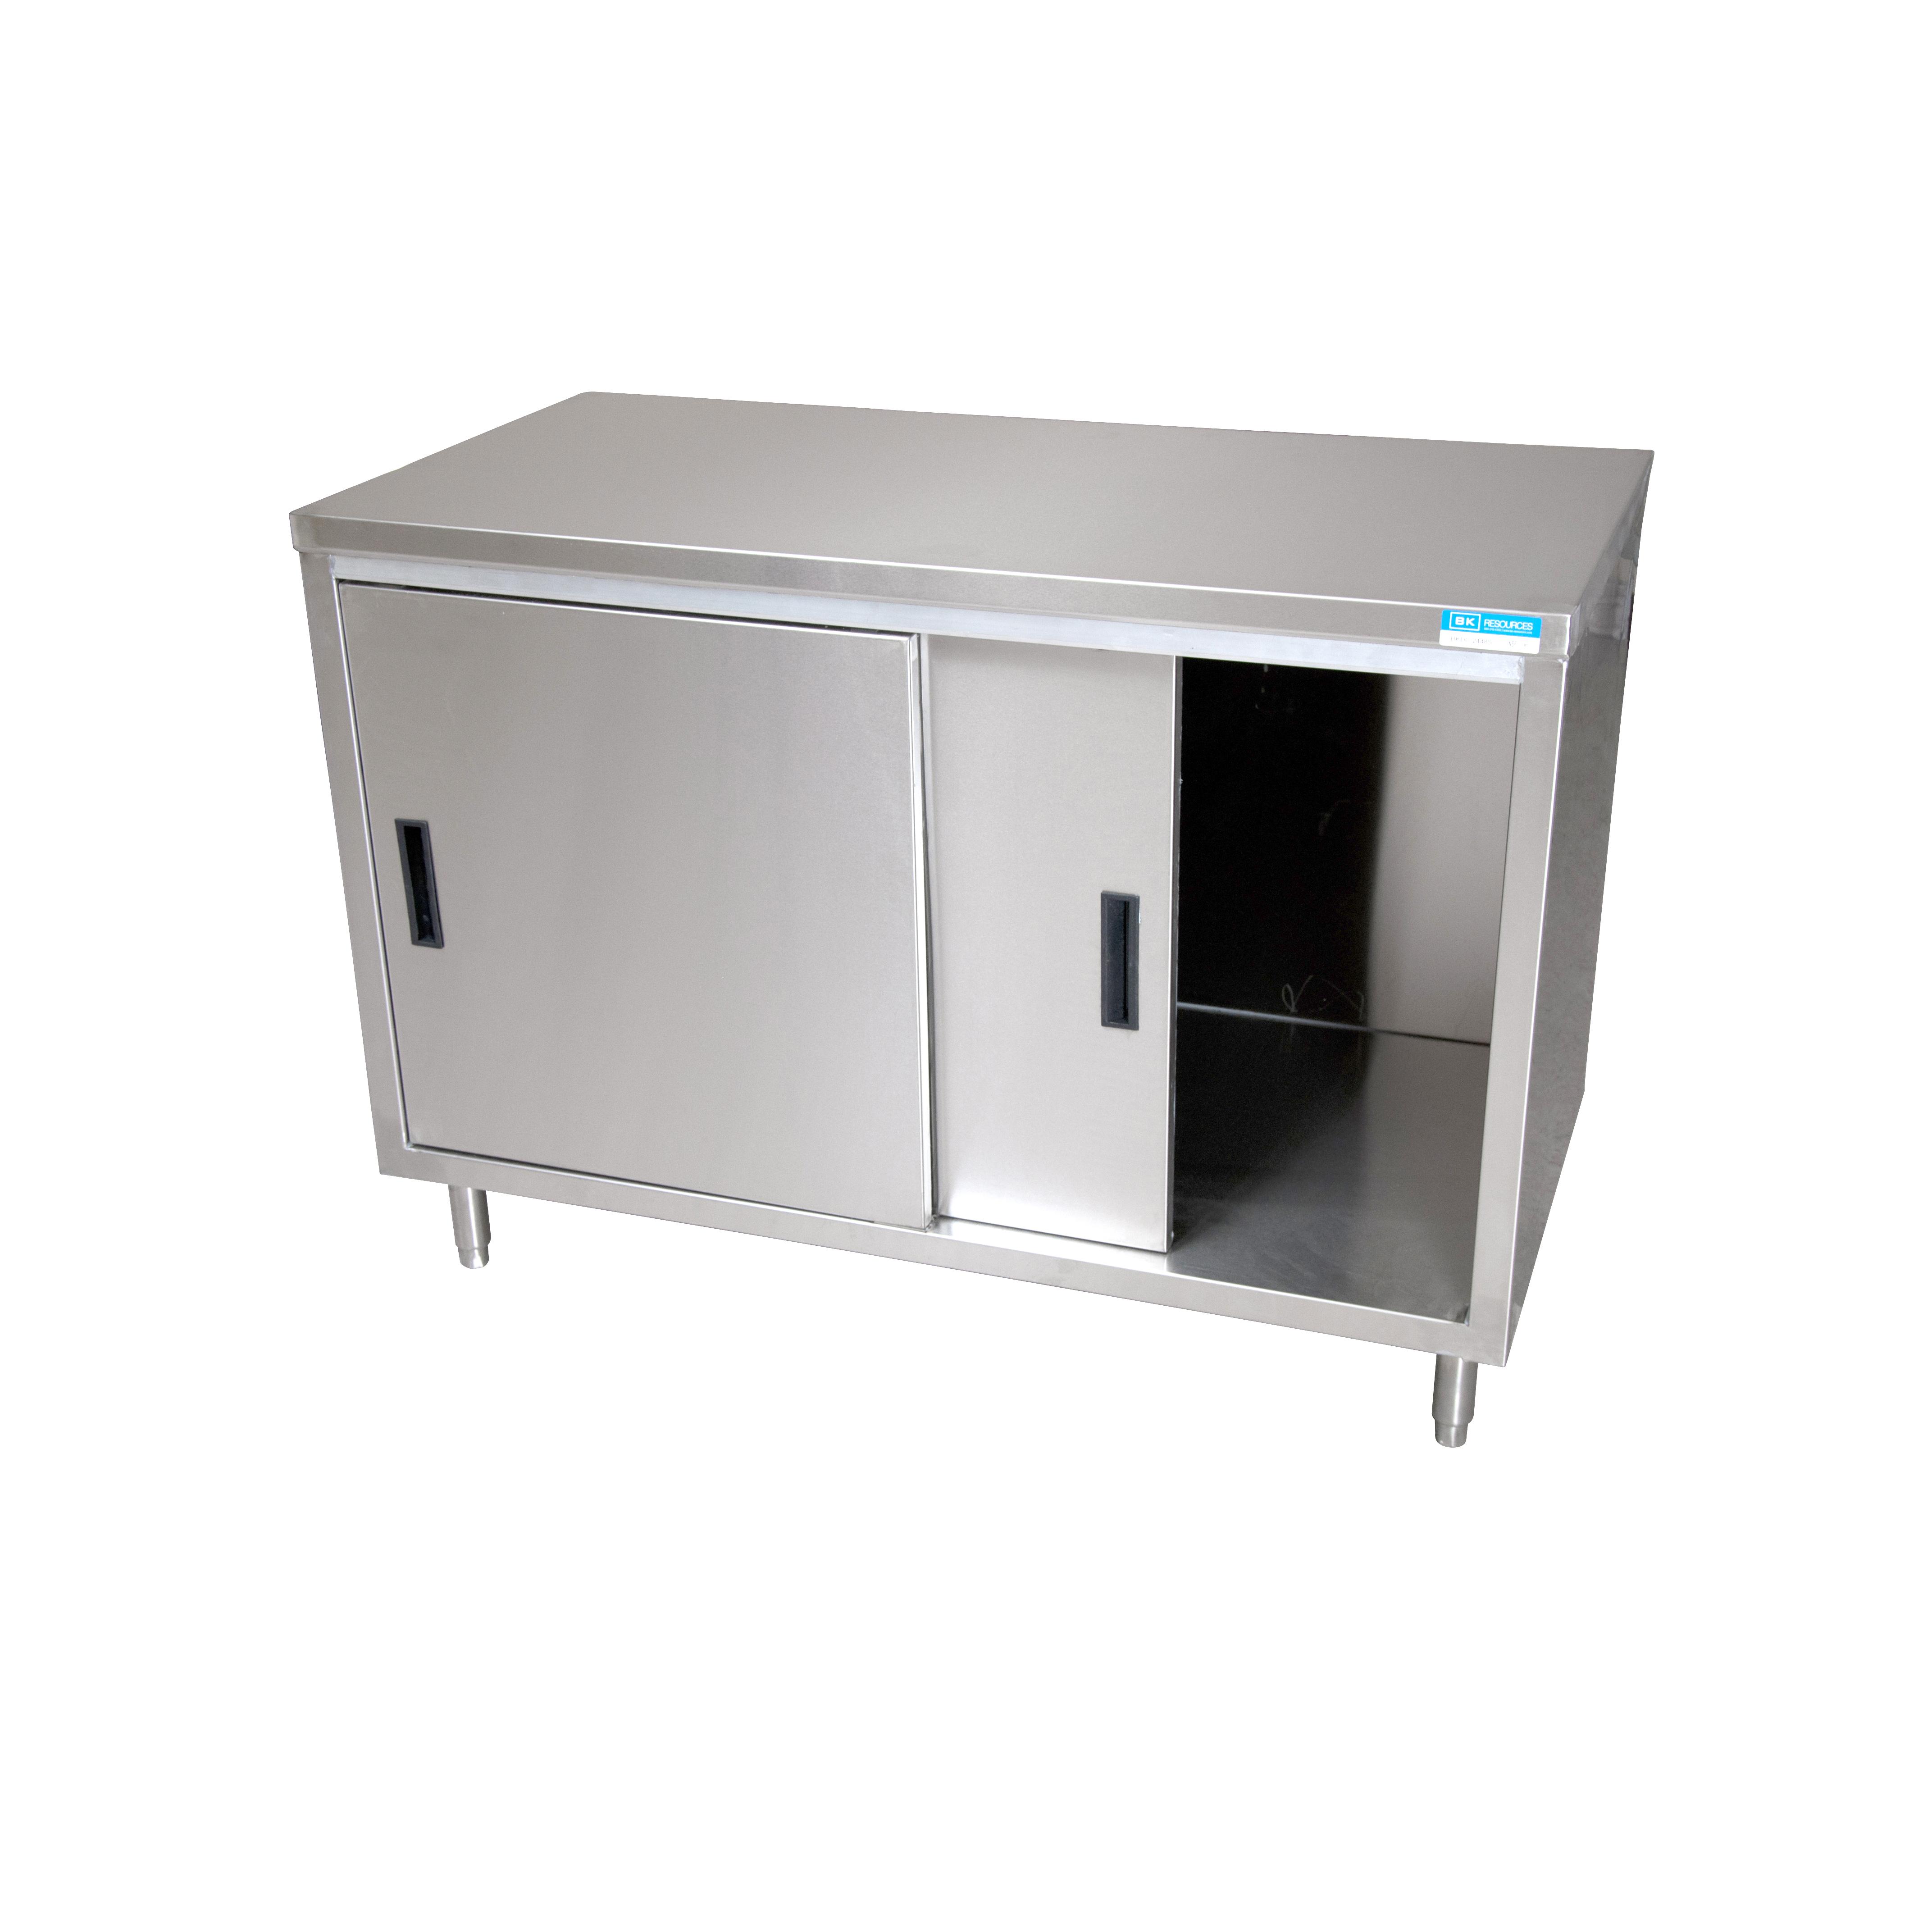 BK Resources BKDC-2448S work table, cabinet base sliding doors